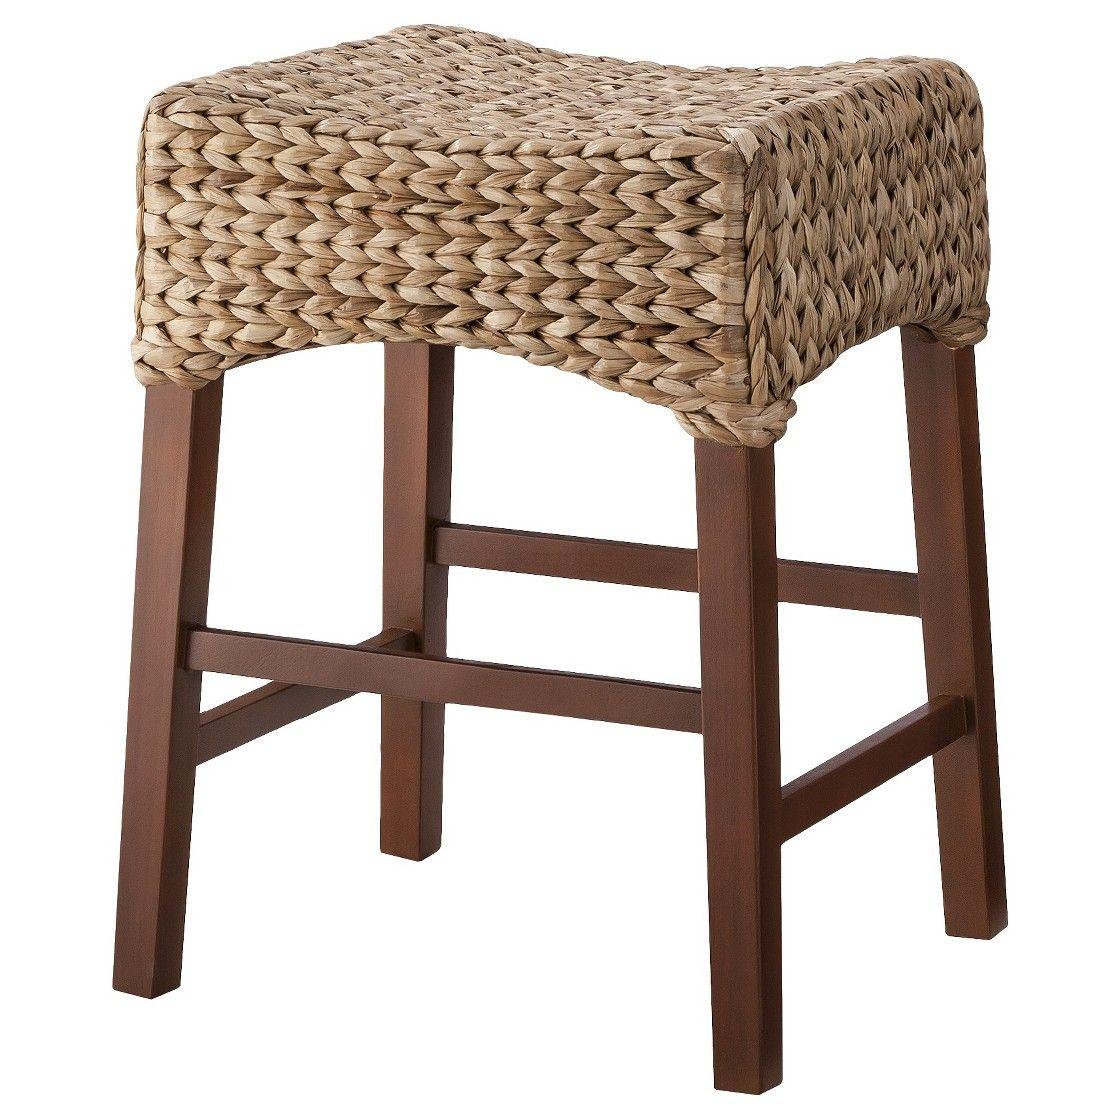 Pleasing Mudhut Andres Saddle Counter Stool For The Home In 2019 Short Links Chair Design For Home Short Linksinfo